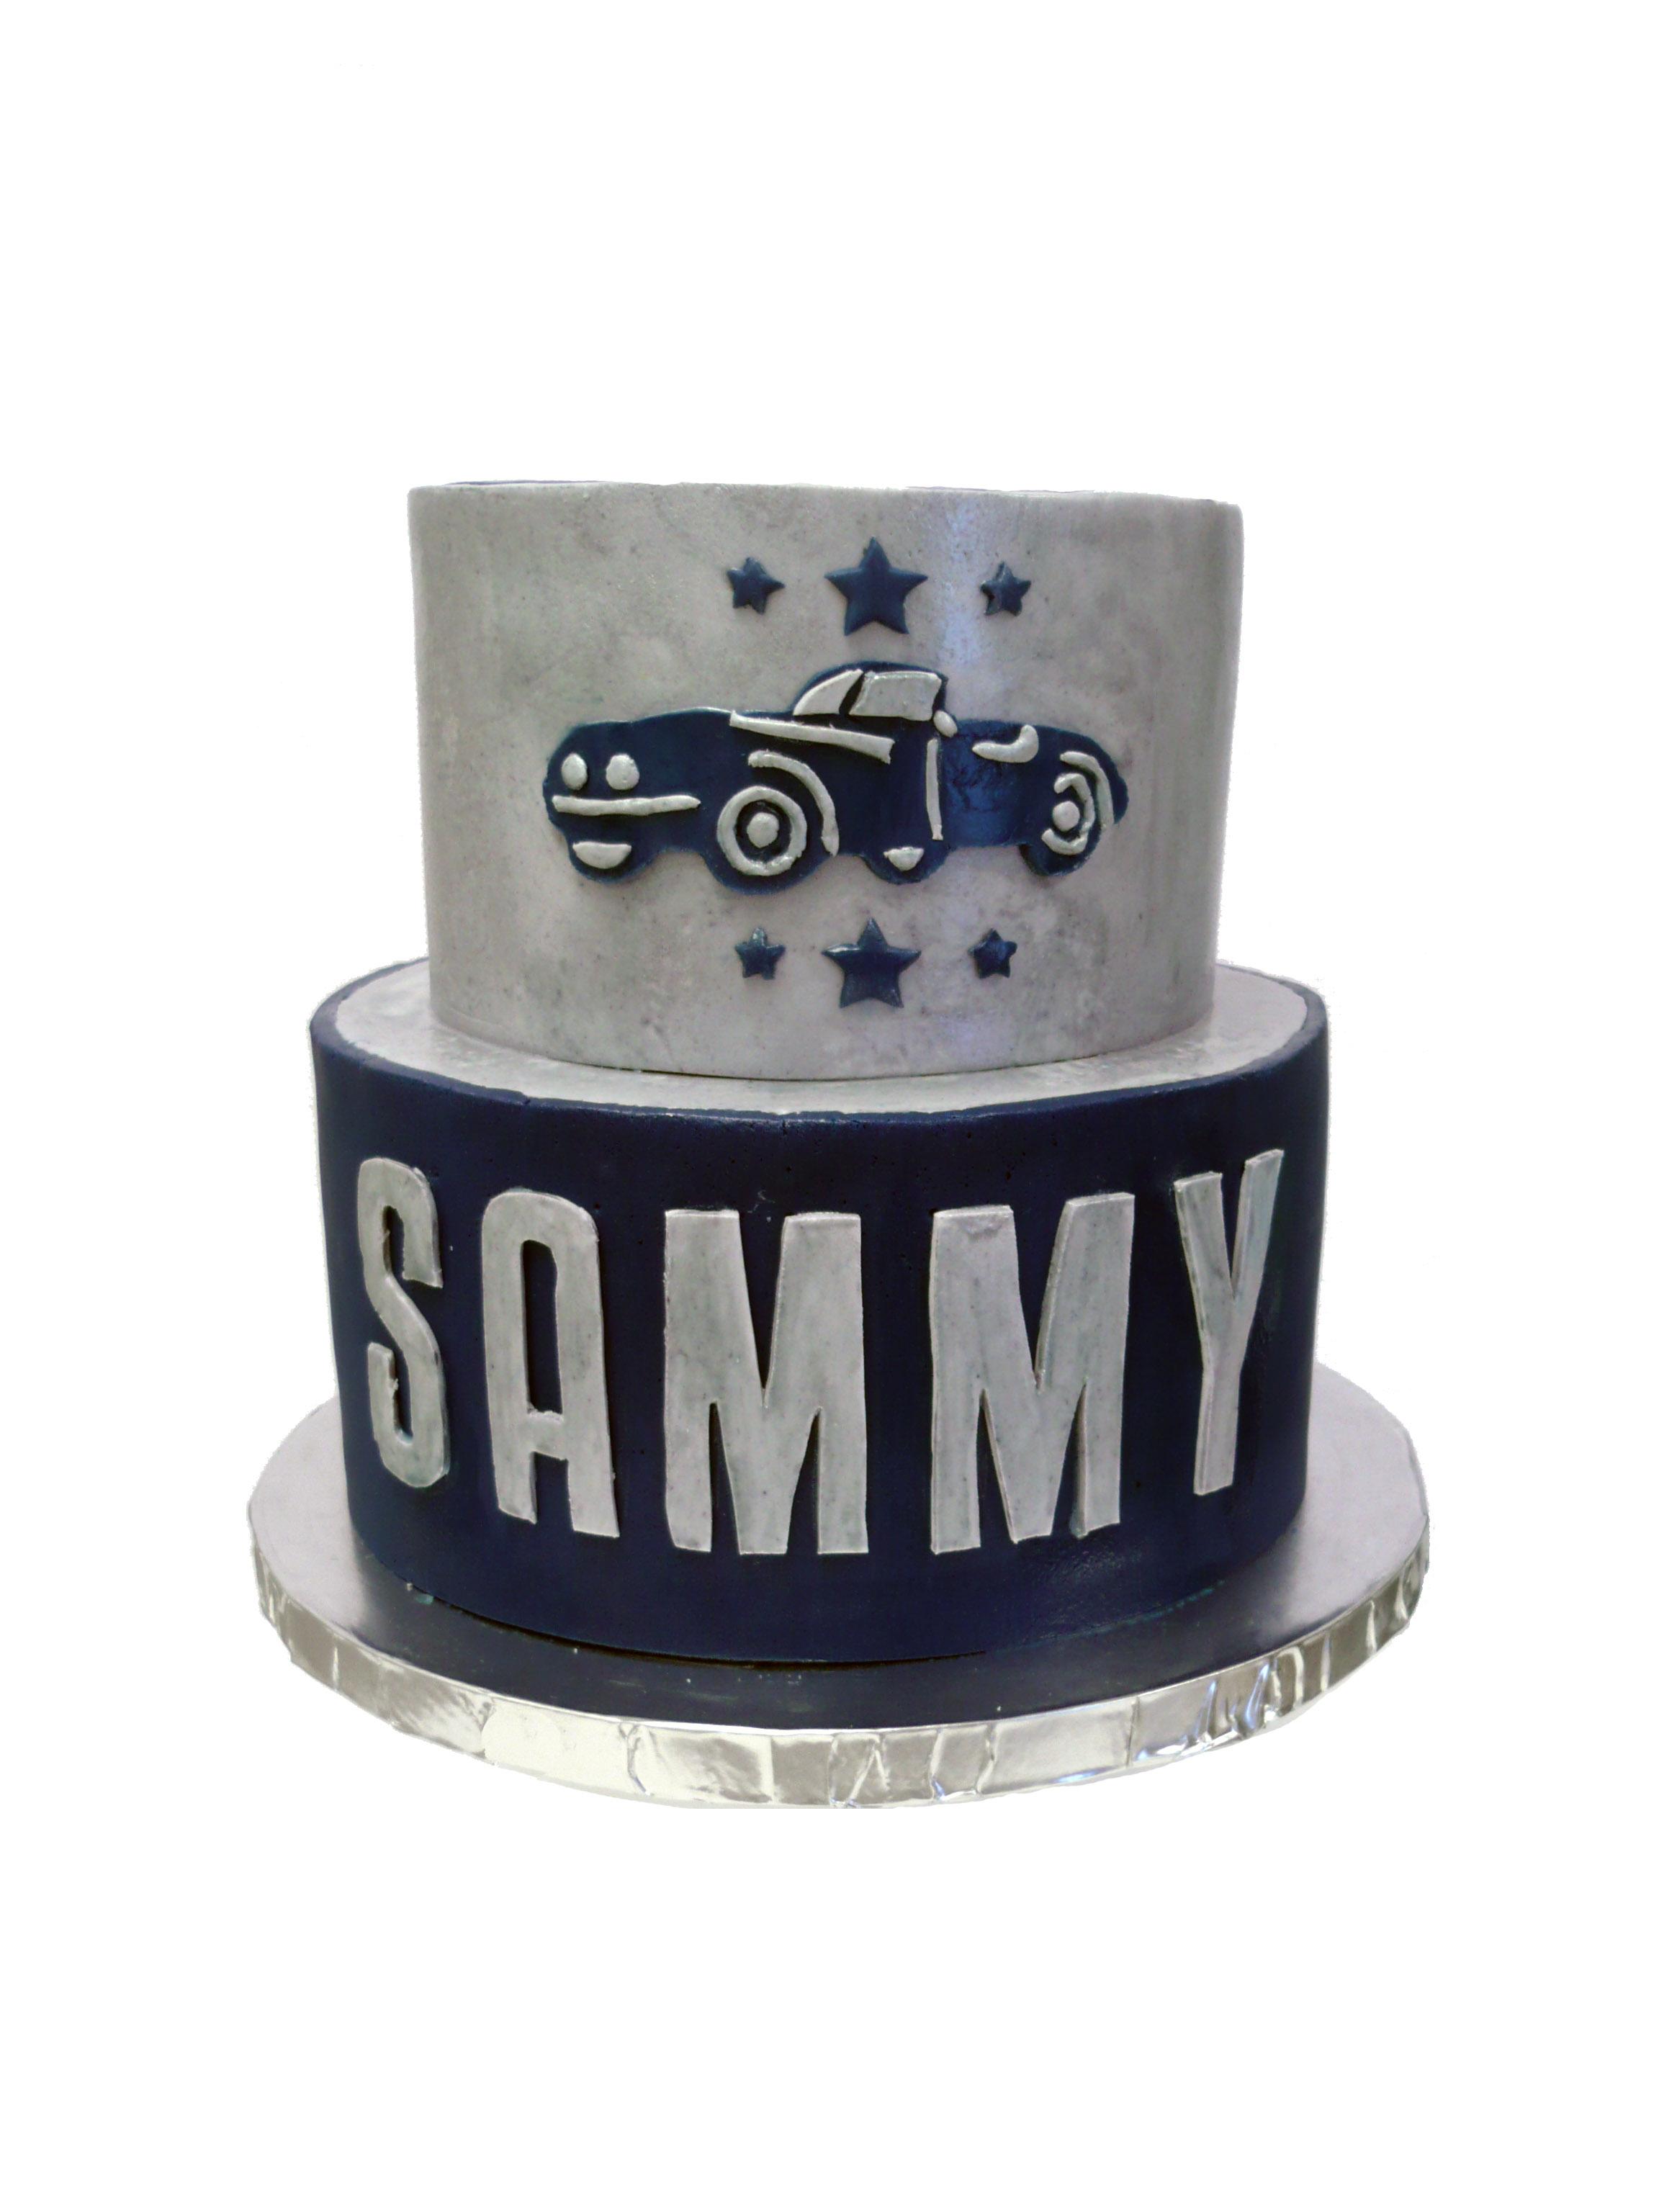 Vintage Car Birthday Cake